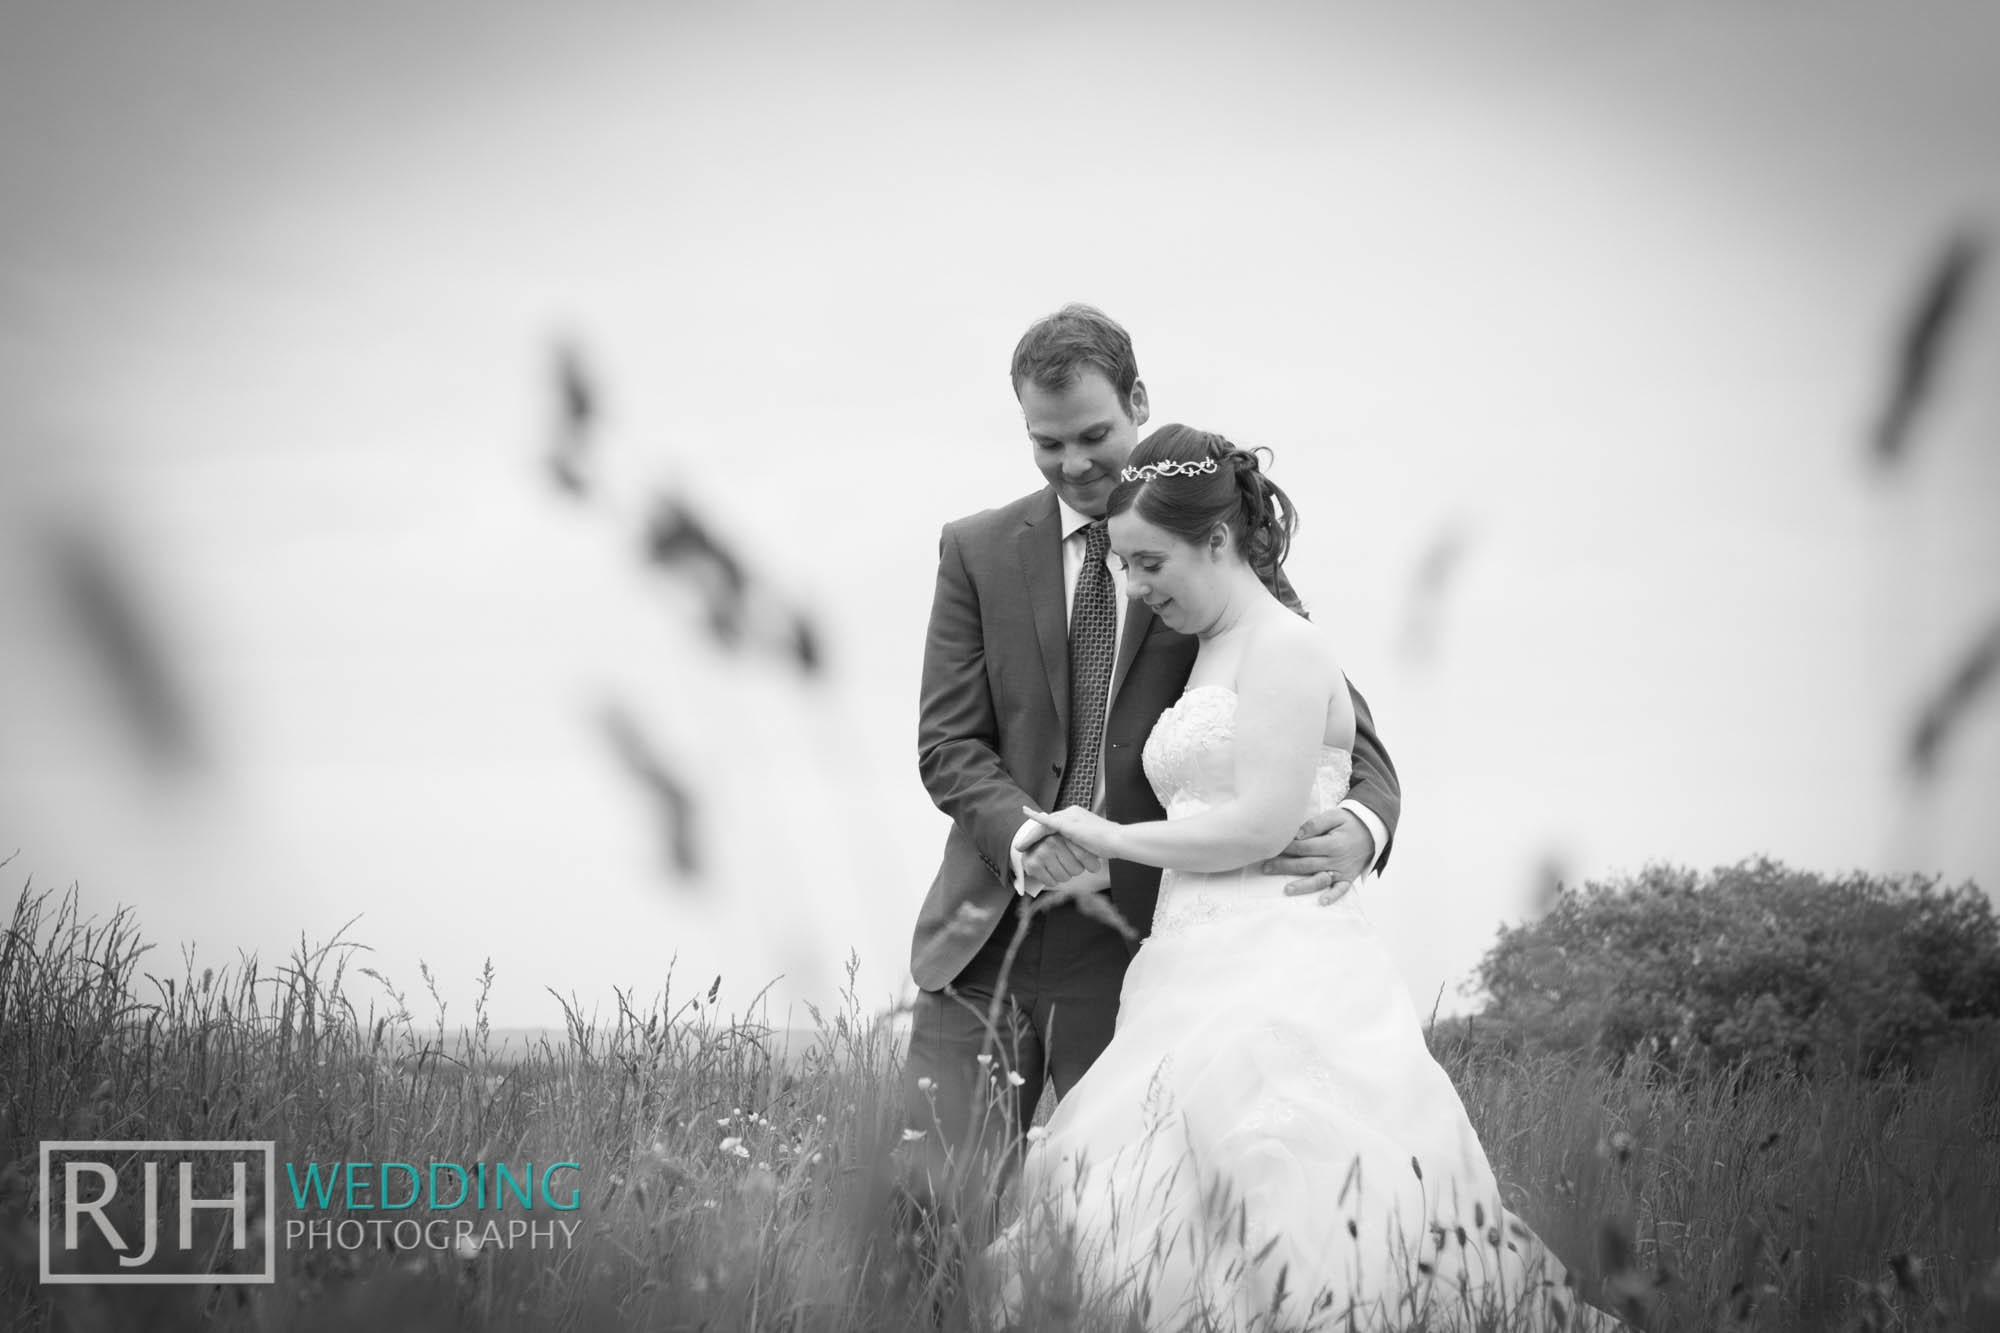 RJH Wedding Photography_2014 highlights_20.jpg